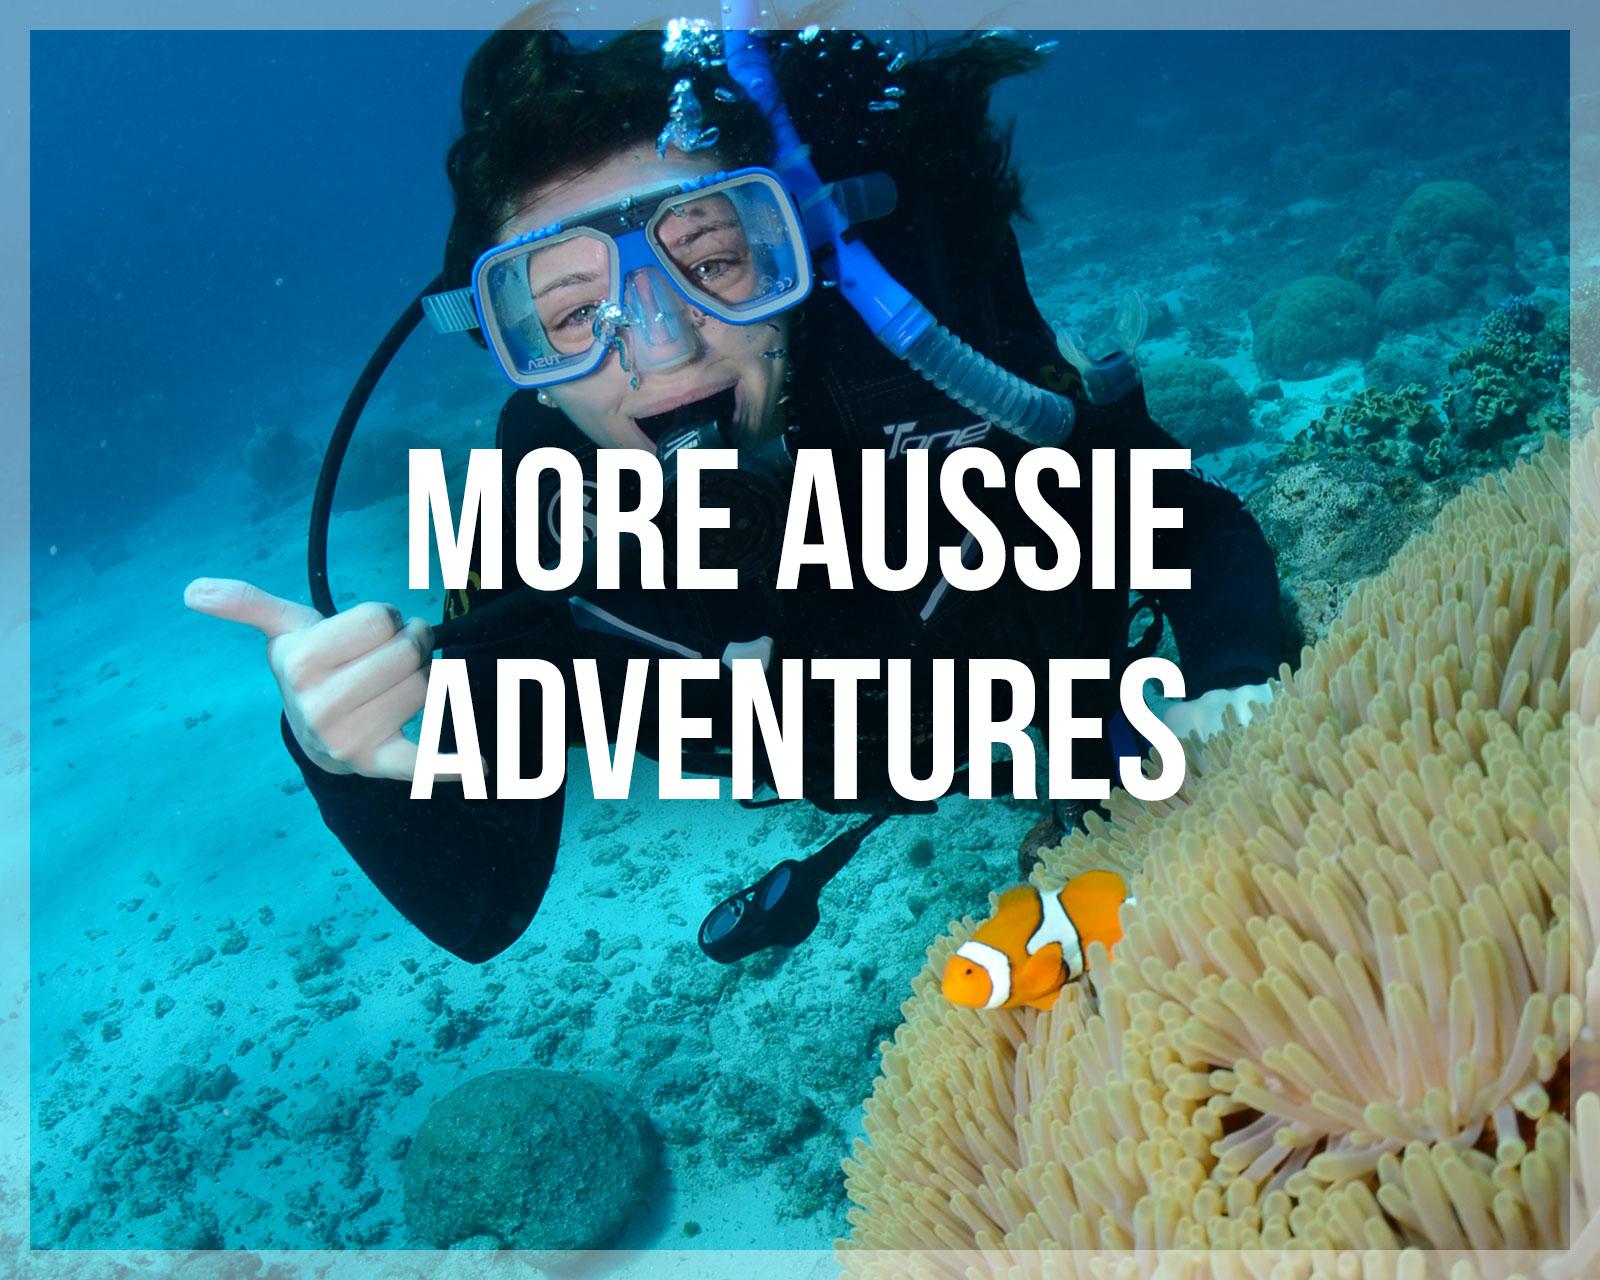 More Aussie Adventures